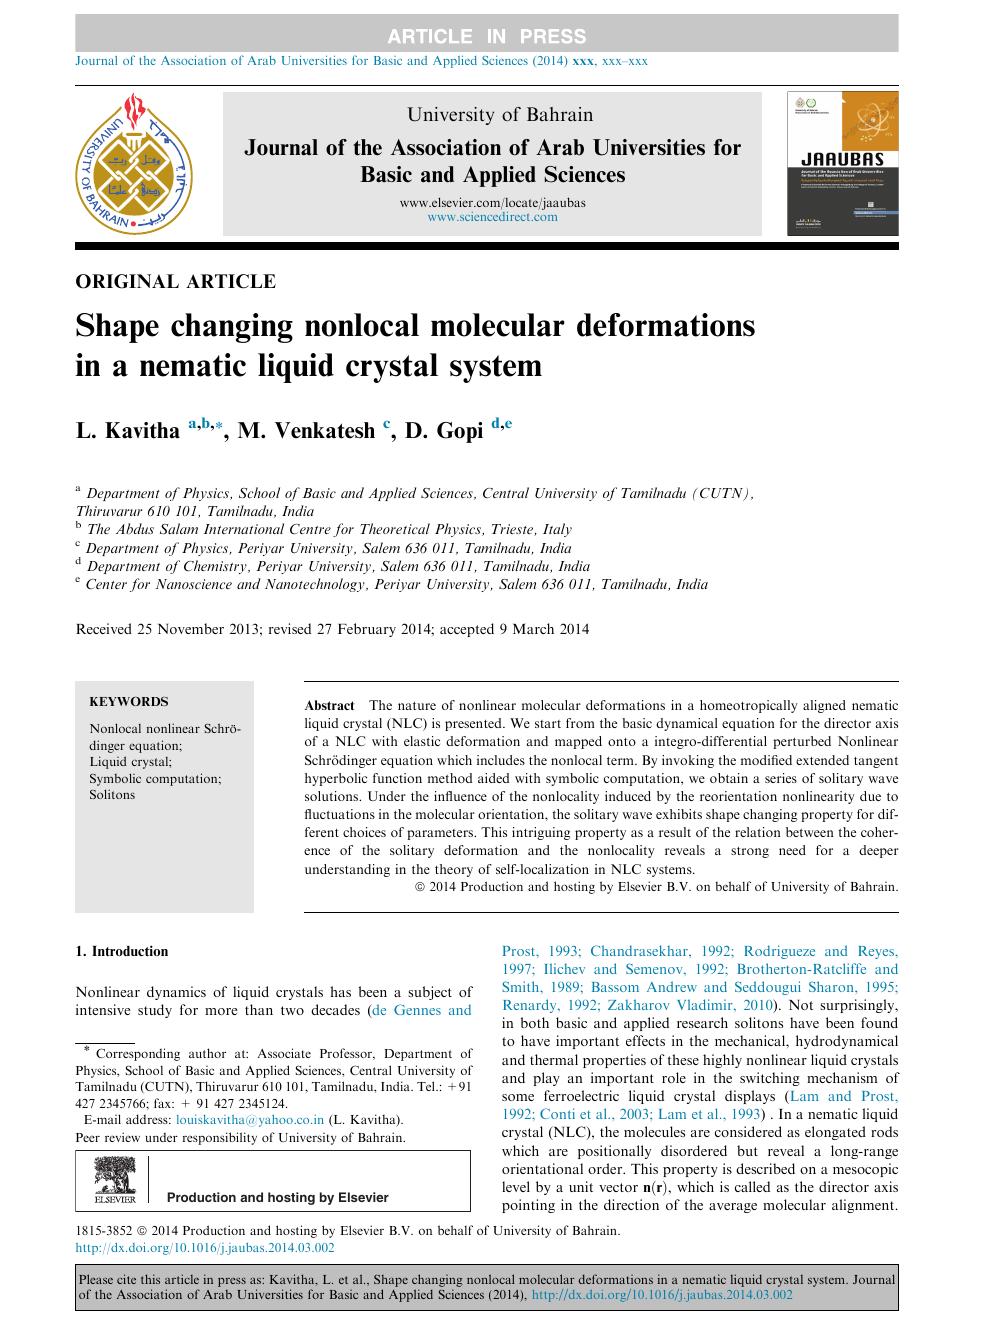 Shape changing nonlocal molecular deformations in a nematic liquid